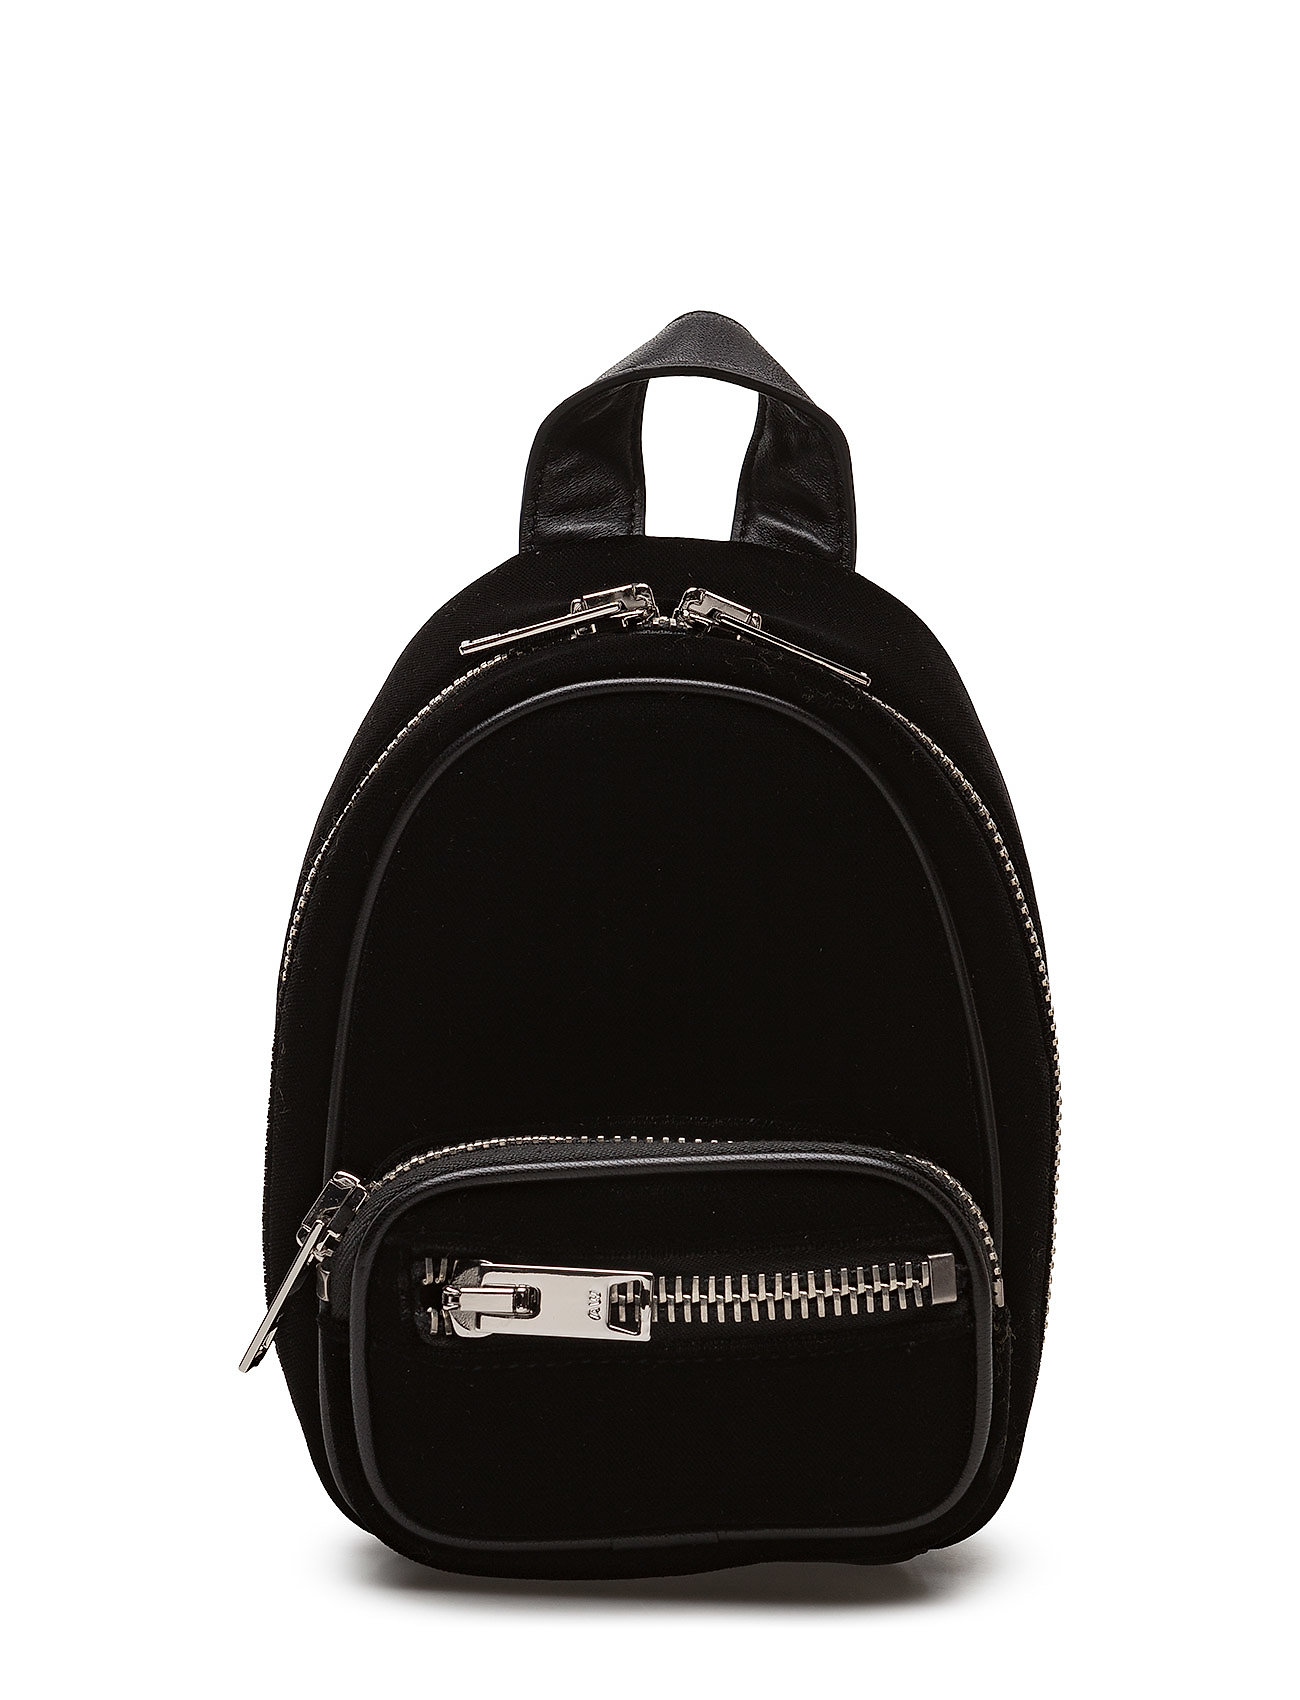 alexander wang – Attica soft mini bkpk black hvy silky velvet/ir fra boozt.com dk